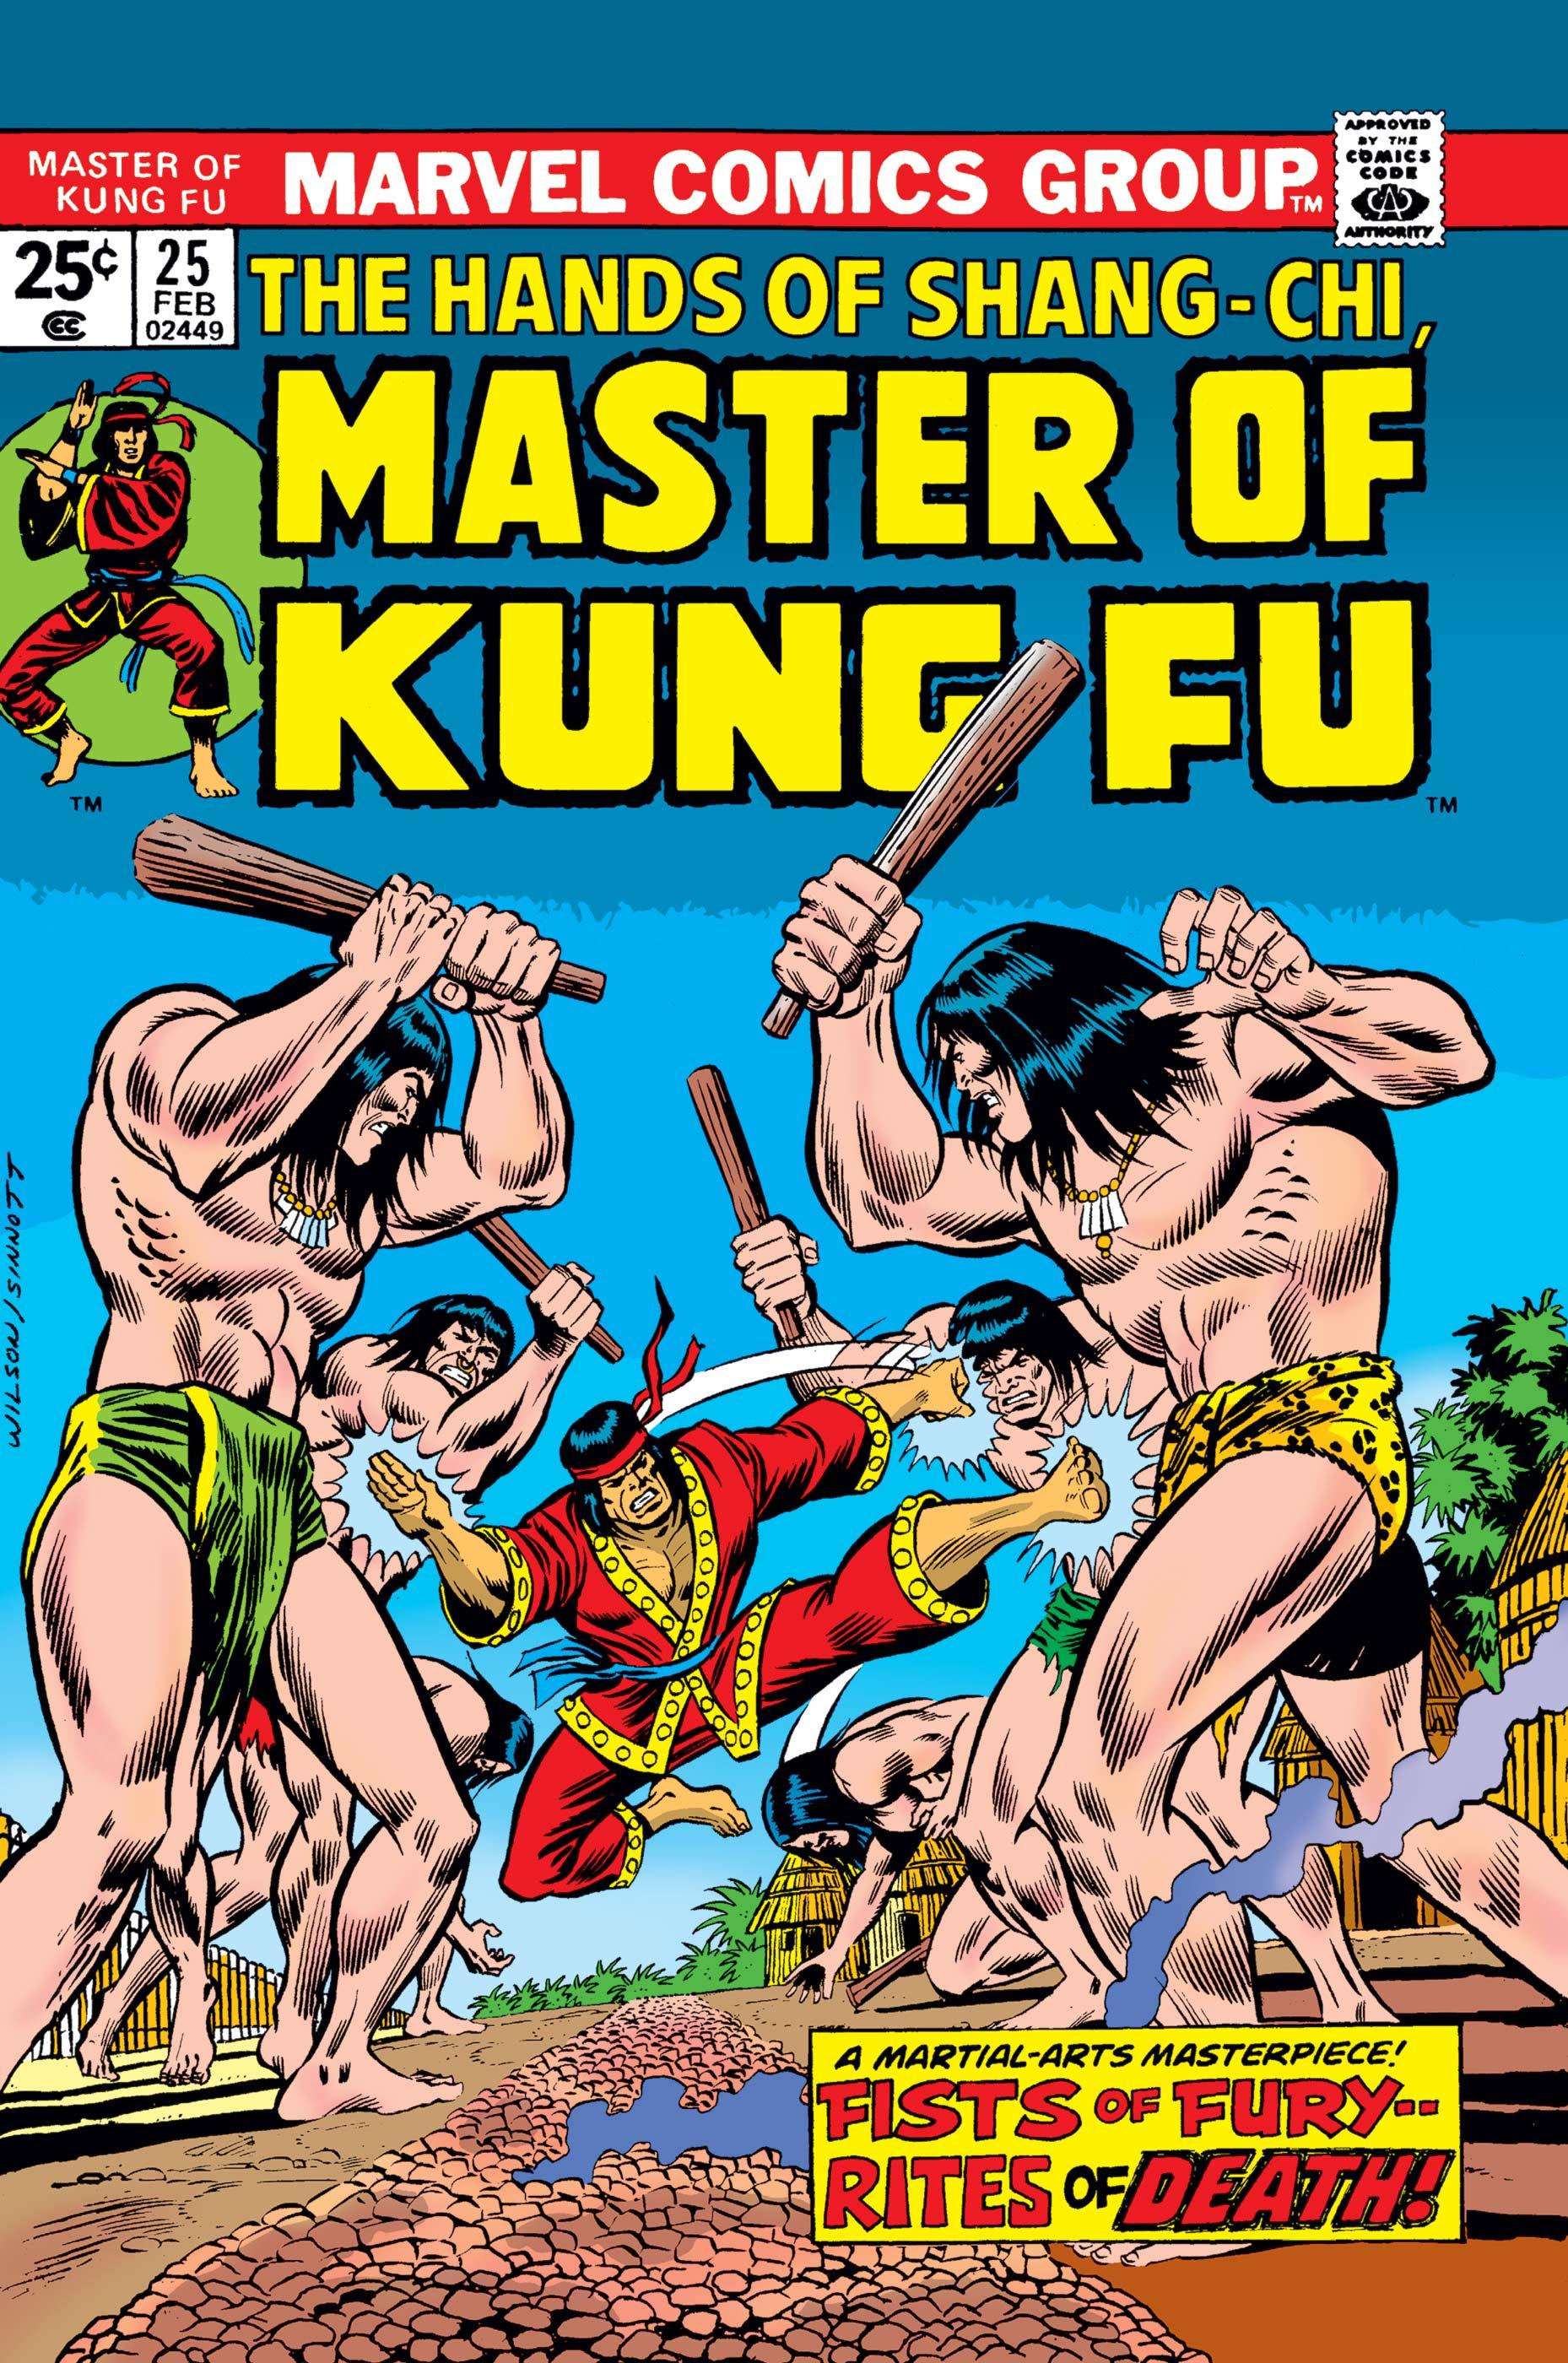 Master of Kung Fu (1974) #25